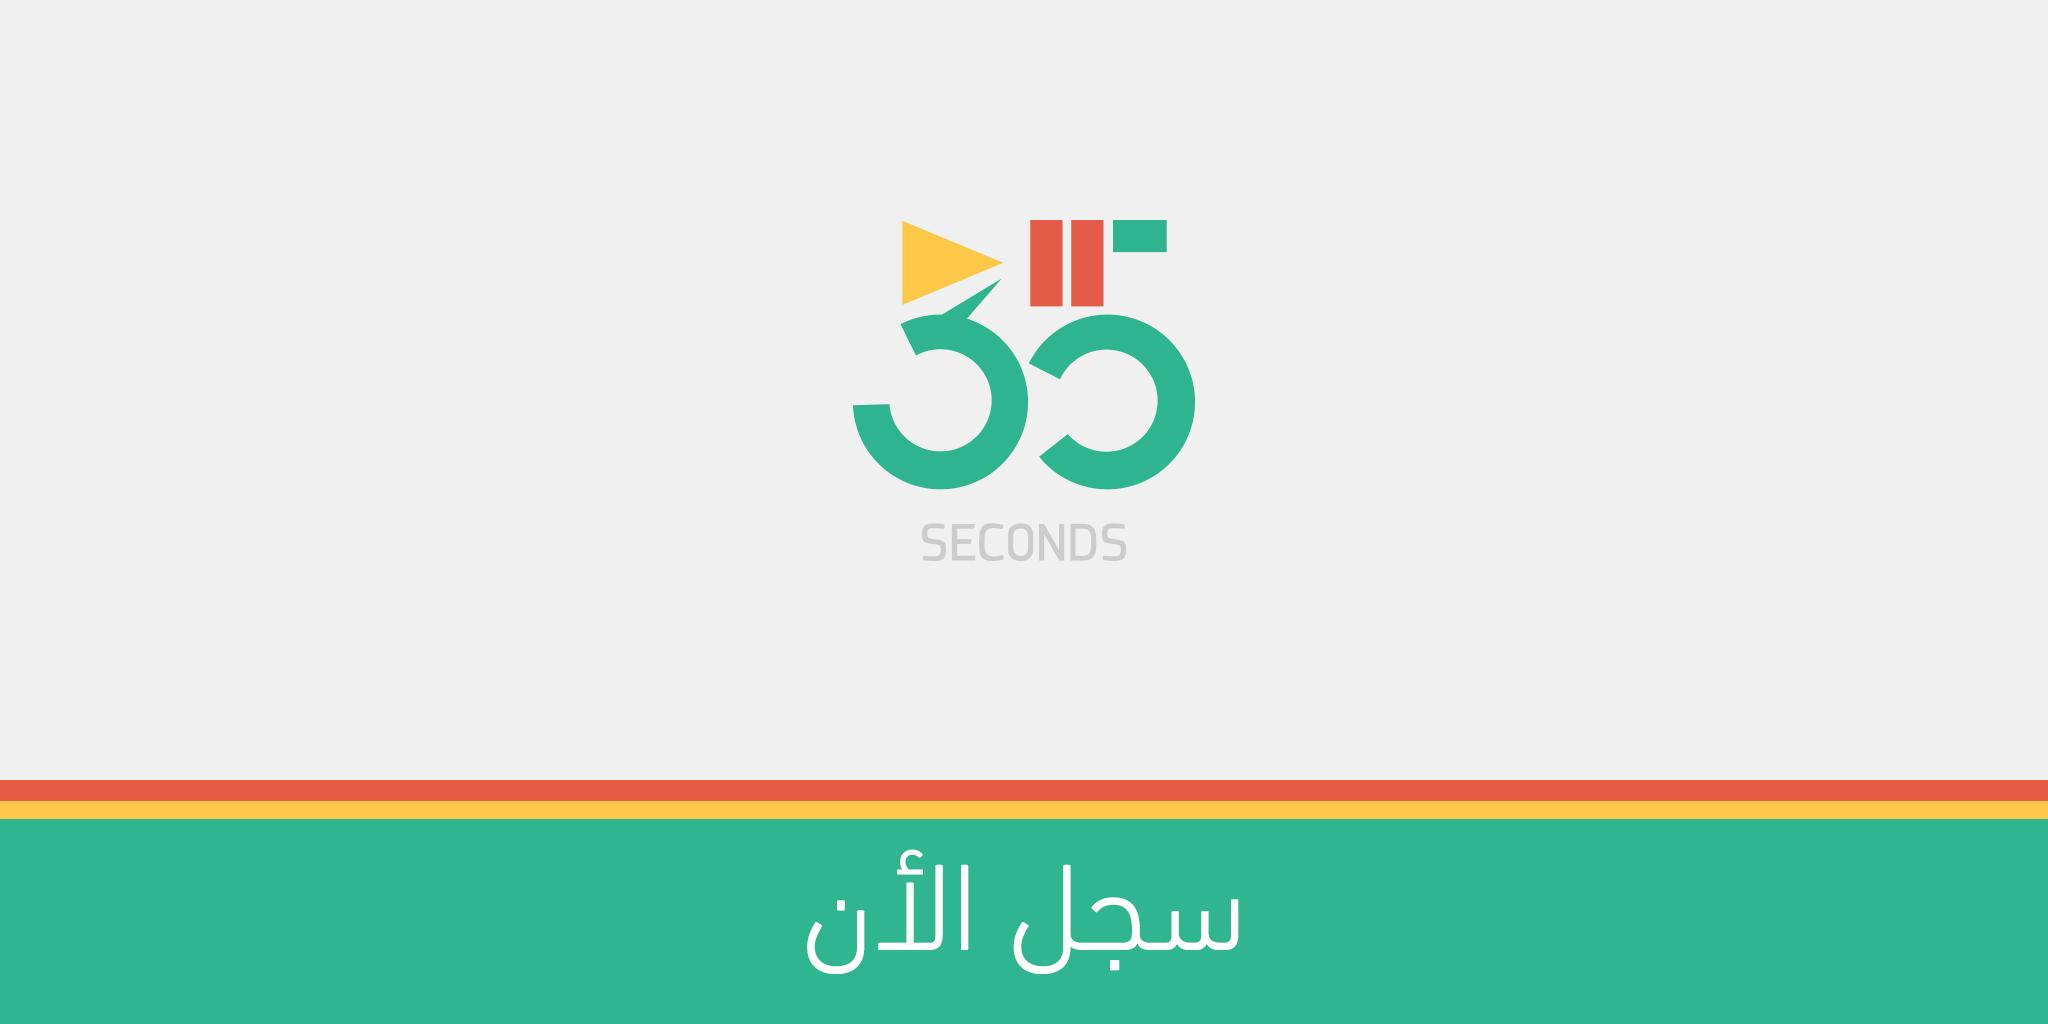 35seconds02